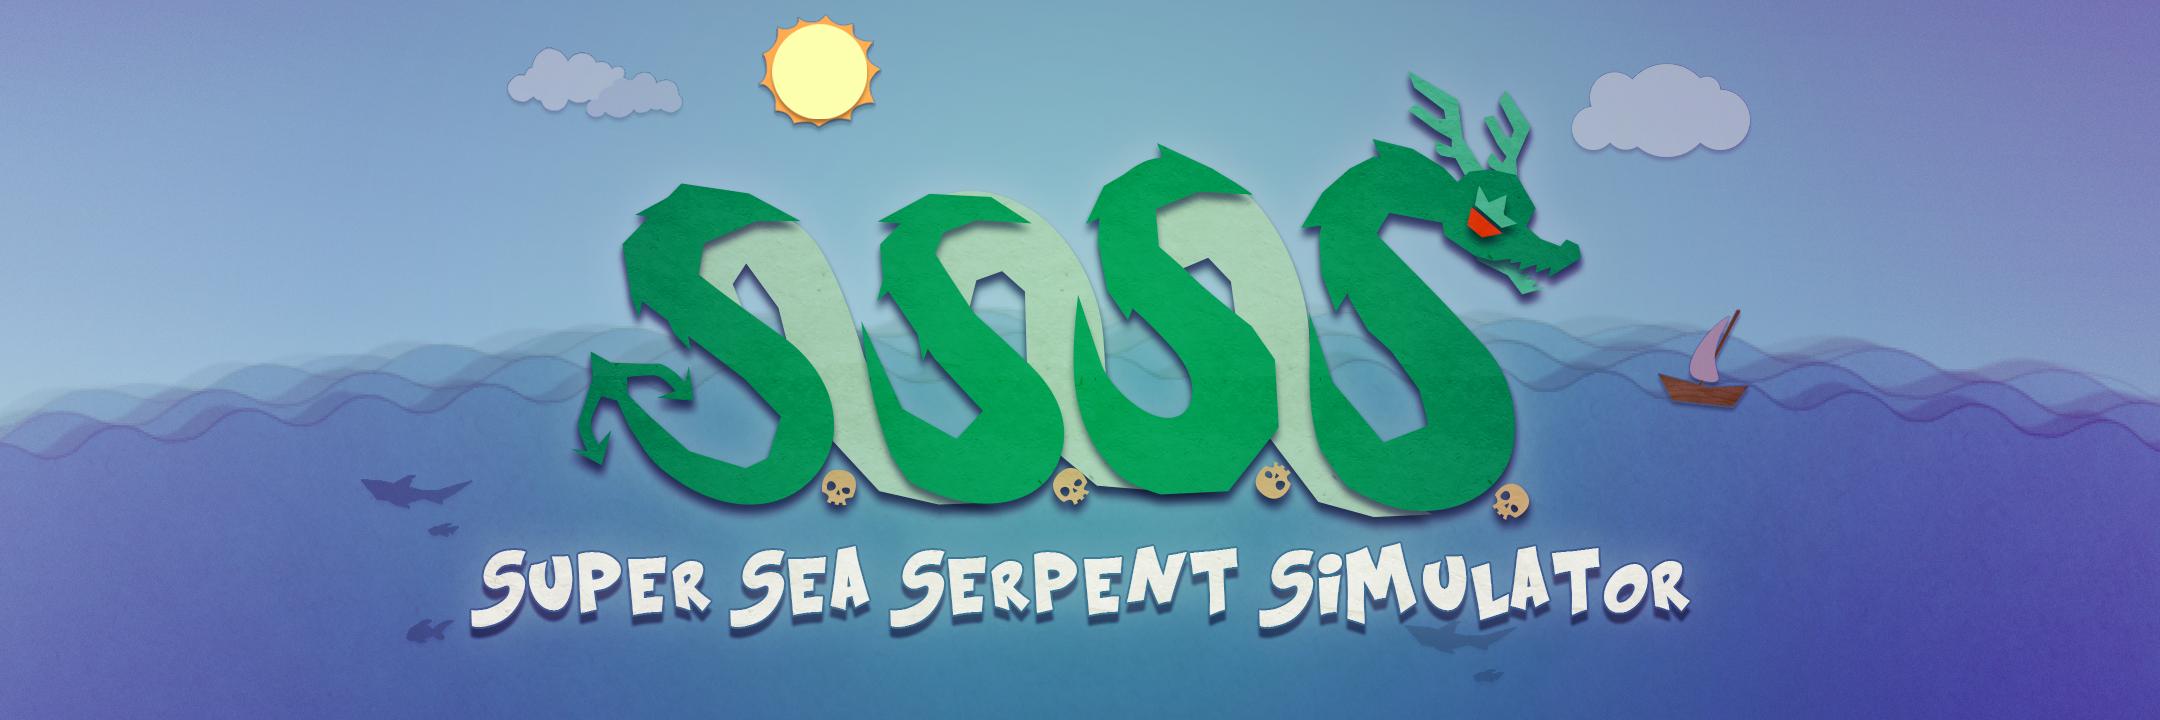 Super Sea Serpent Simulator